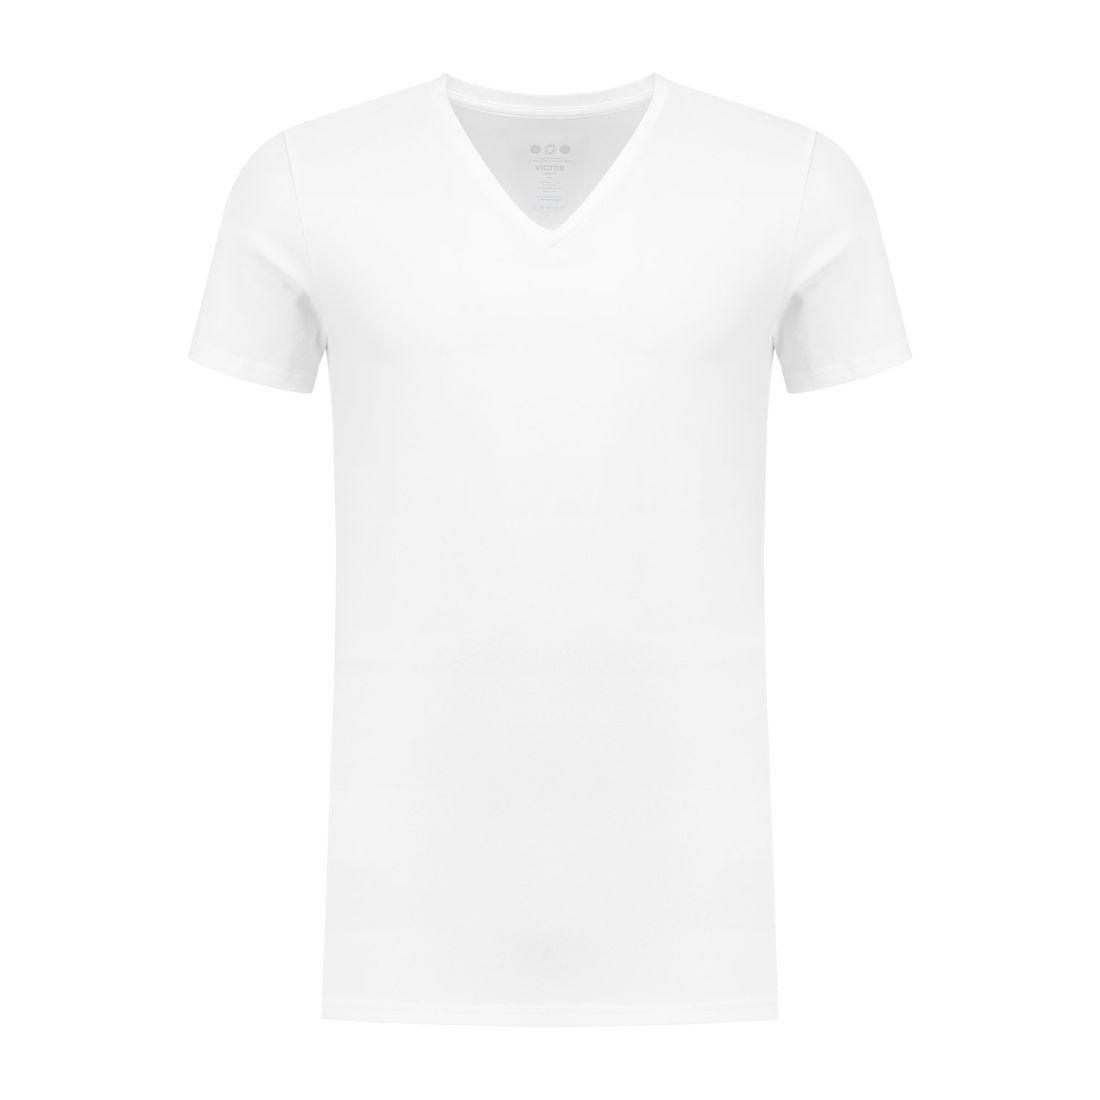 Afbeelding van A dam Underwear victor V hals shirt wit heren